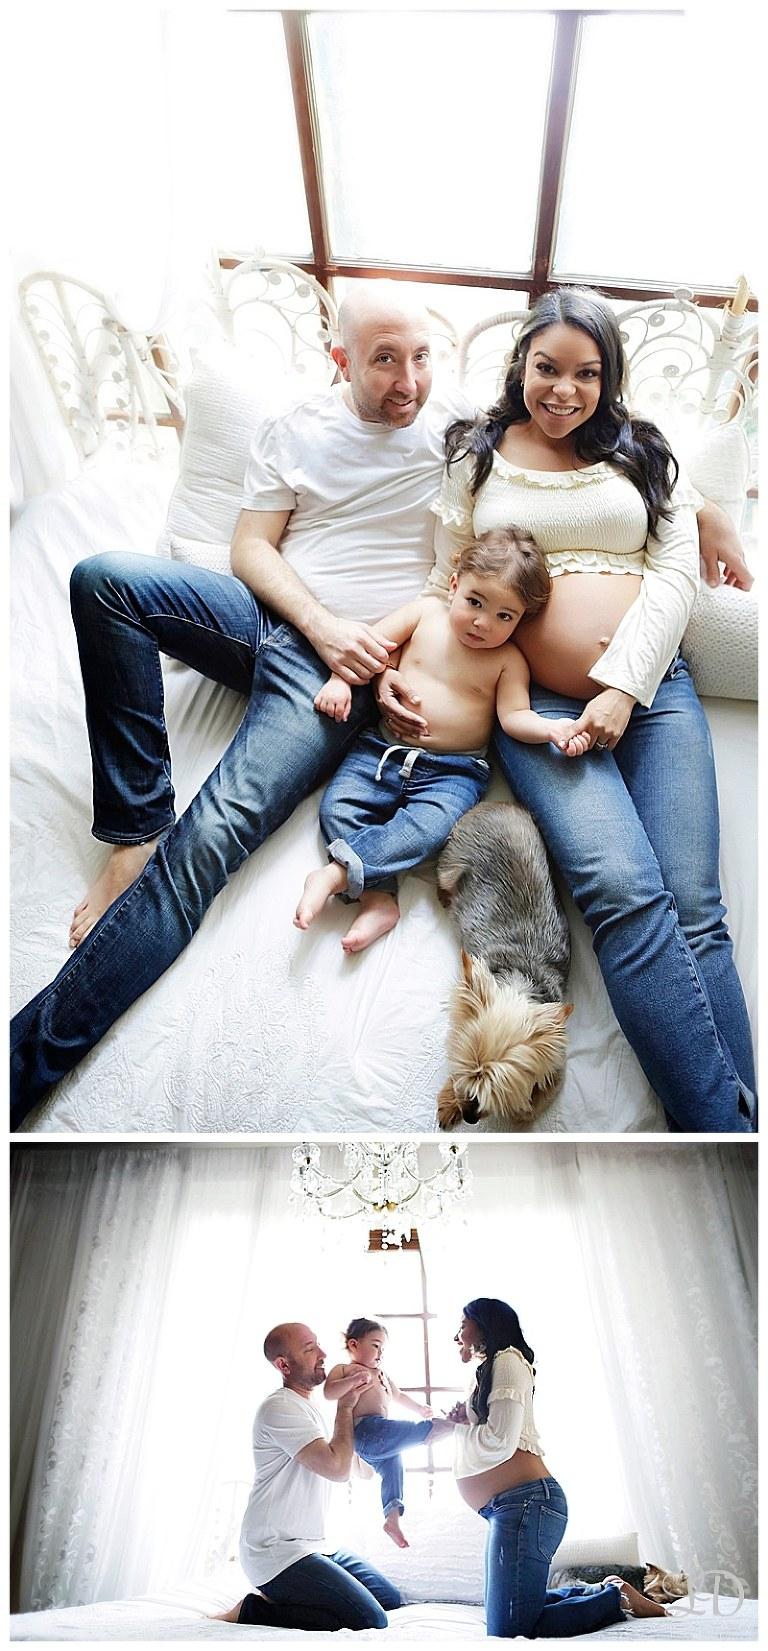 sweet maternity photoshoot-lori dorman photography-maternity boudoir-professional photographer_5194.jpg